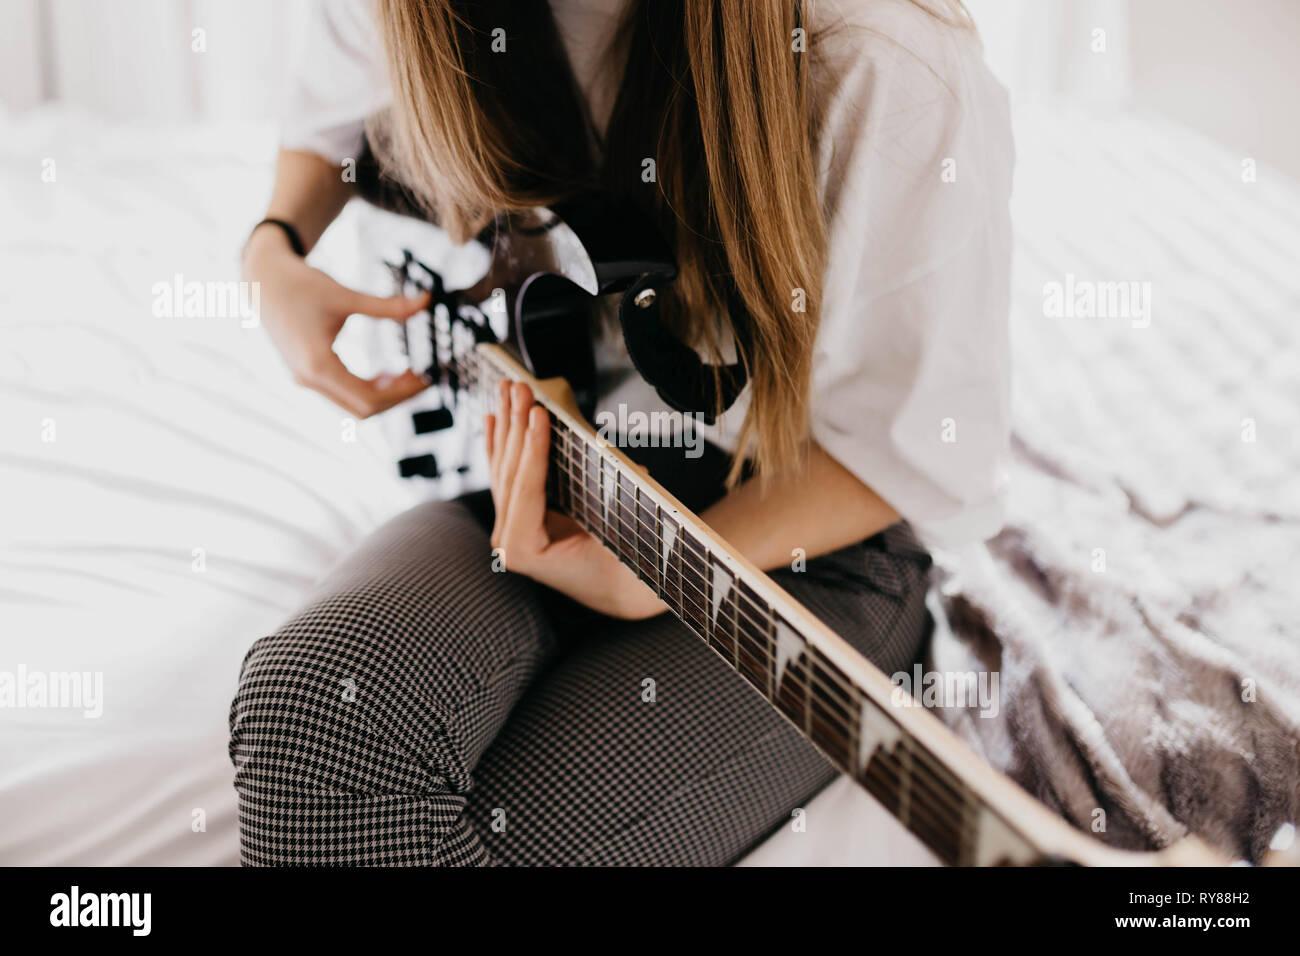 Mujer joven morenita tocando la guitarra Foto de stock